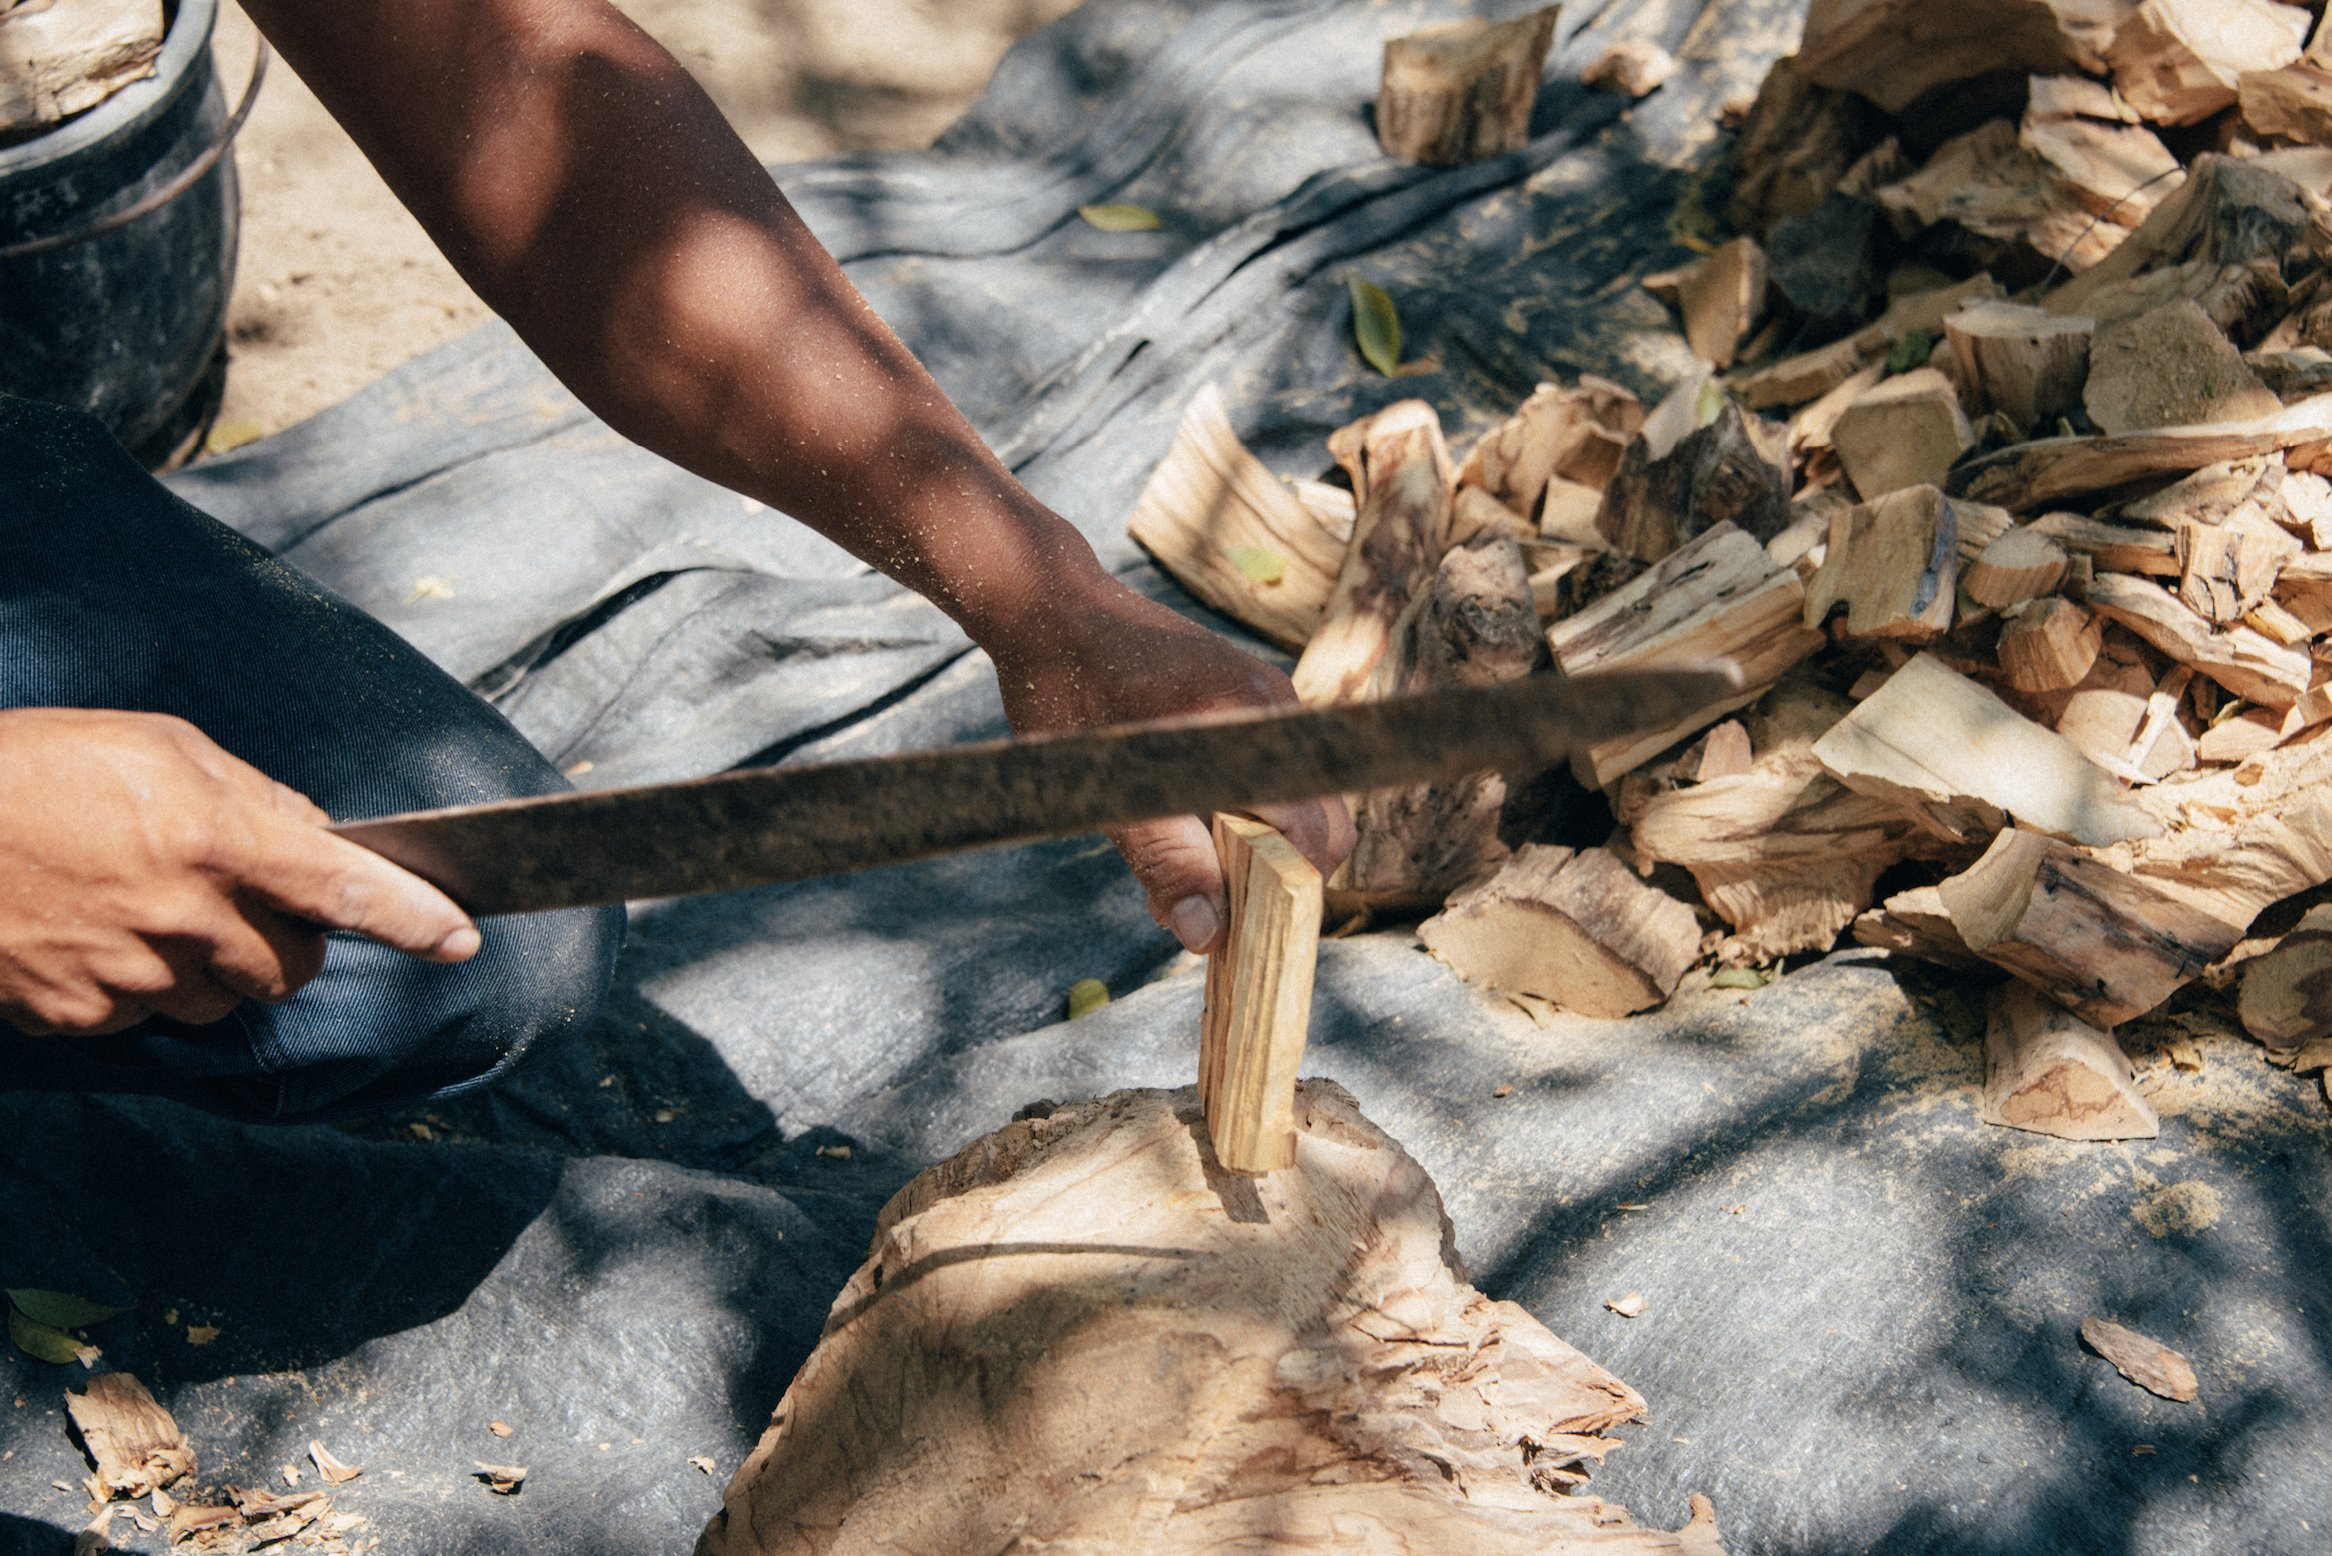 Luna Sundara Palo Santo from Perú Smudging Sticks Large Chunks, High Resin 1 Pound Bag. by Luna Sundara (Image #4)